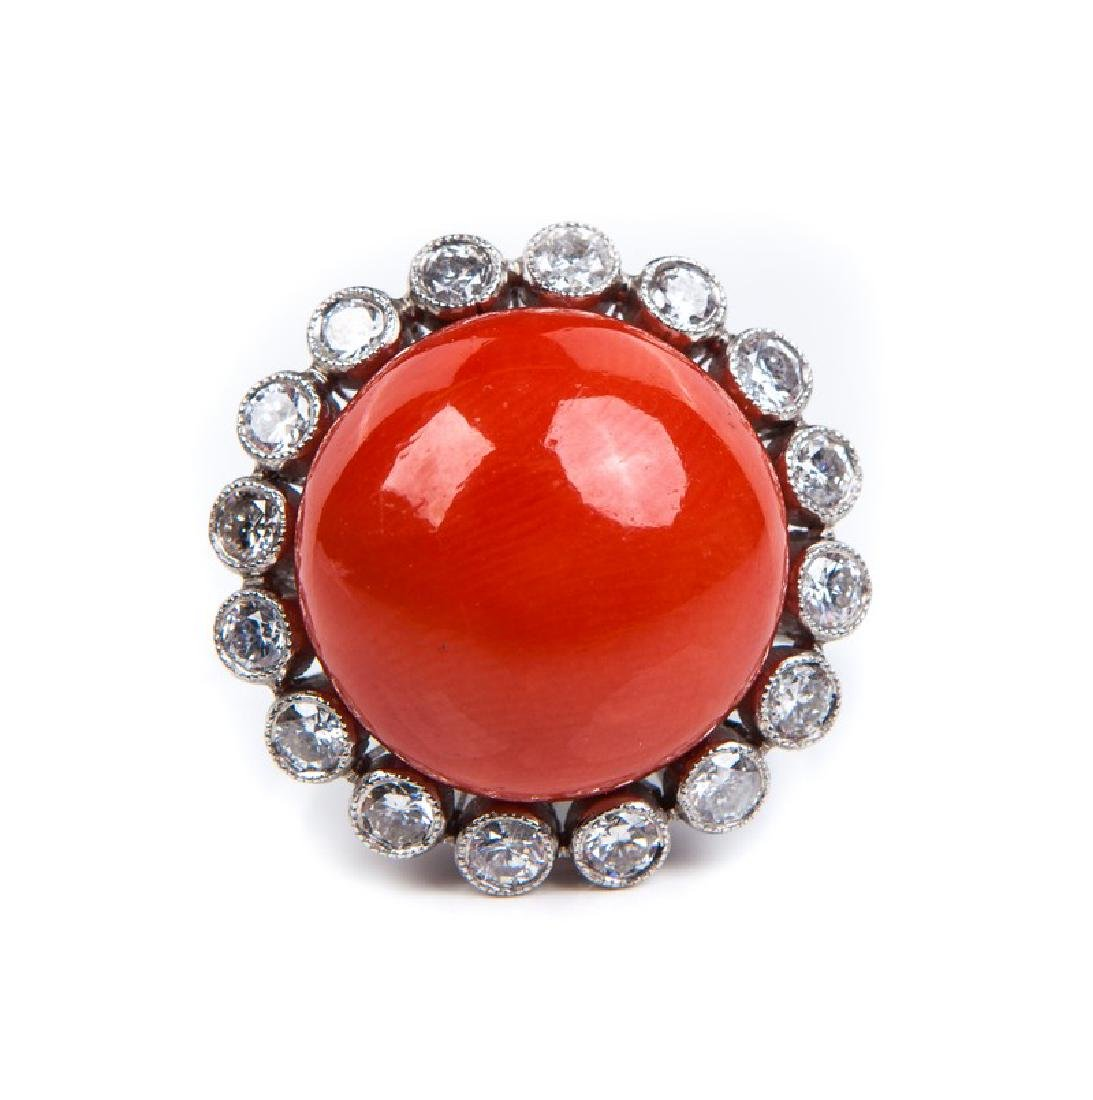 VINTAGE CORAL DIAMOND AND PLATINUM RING - 2